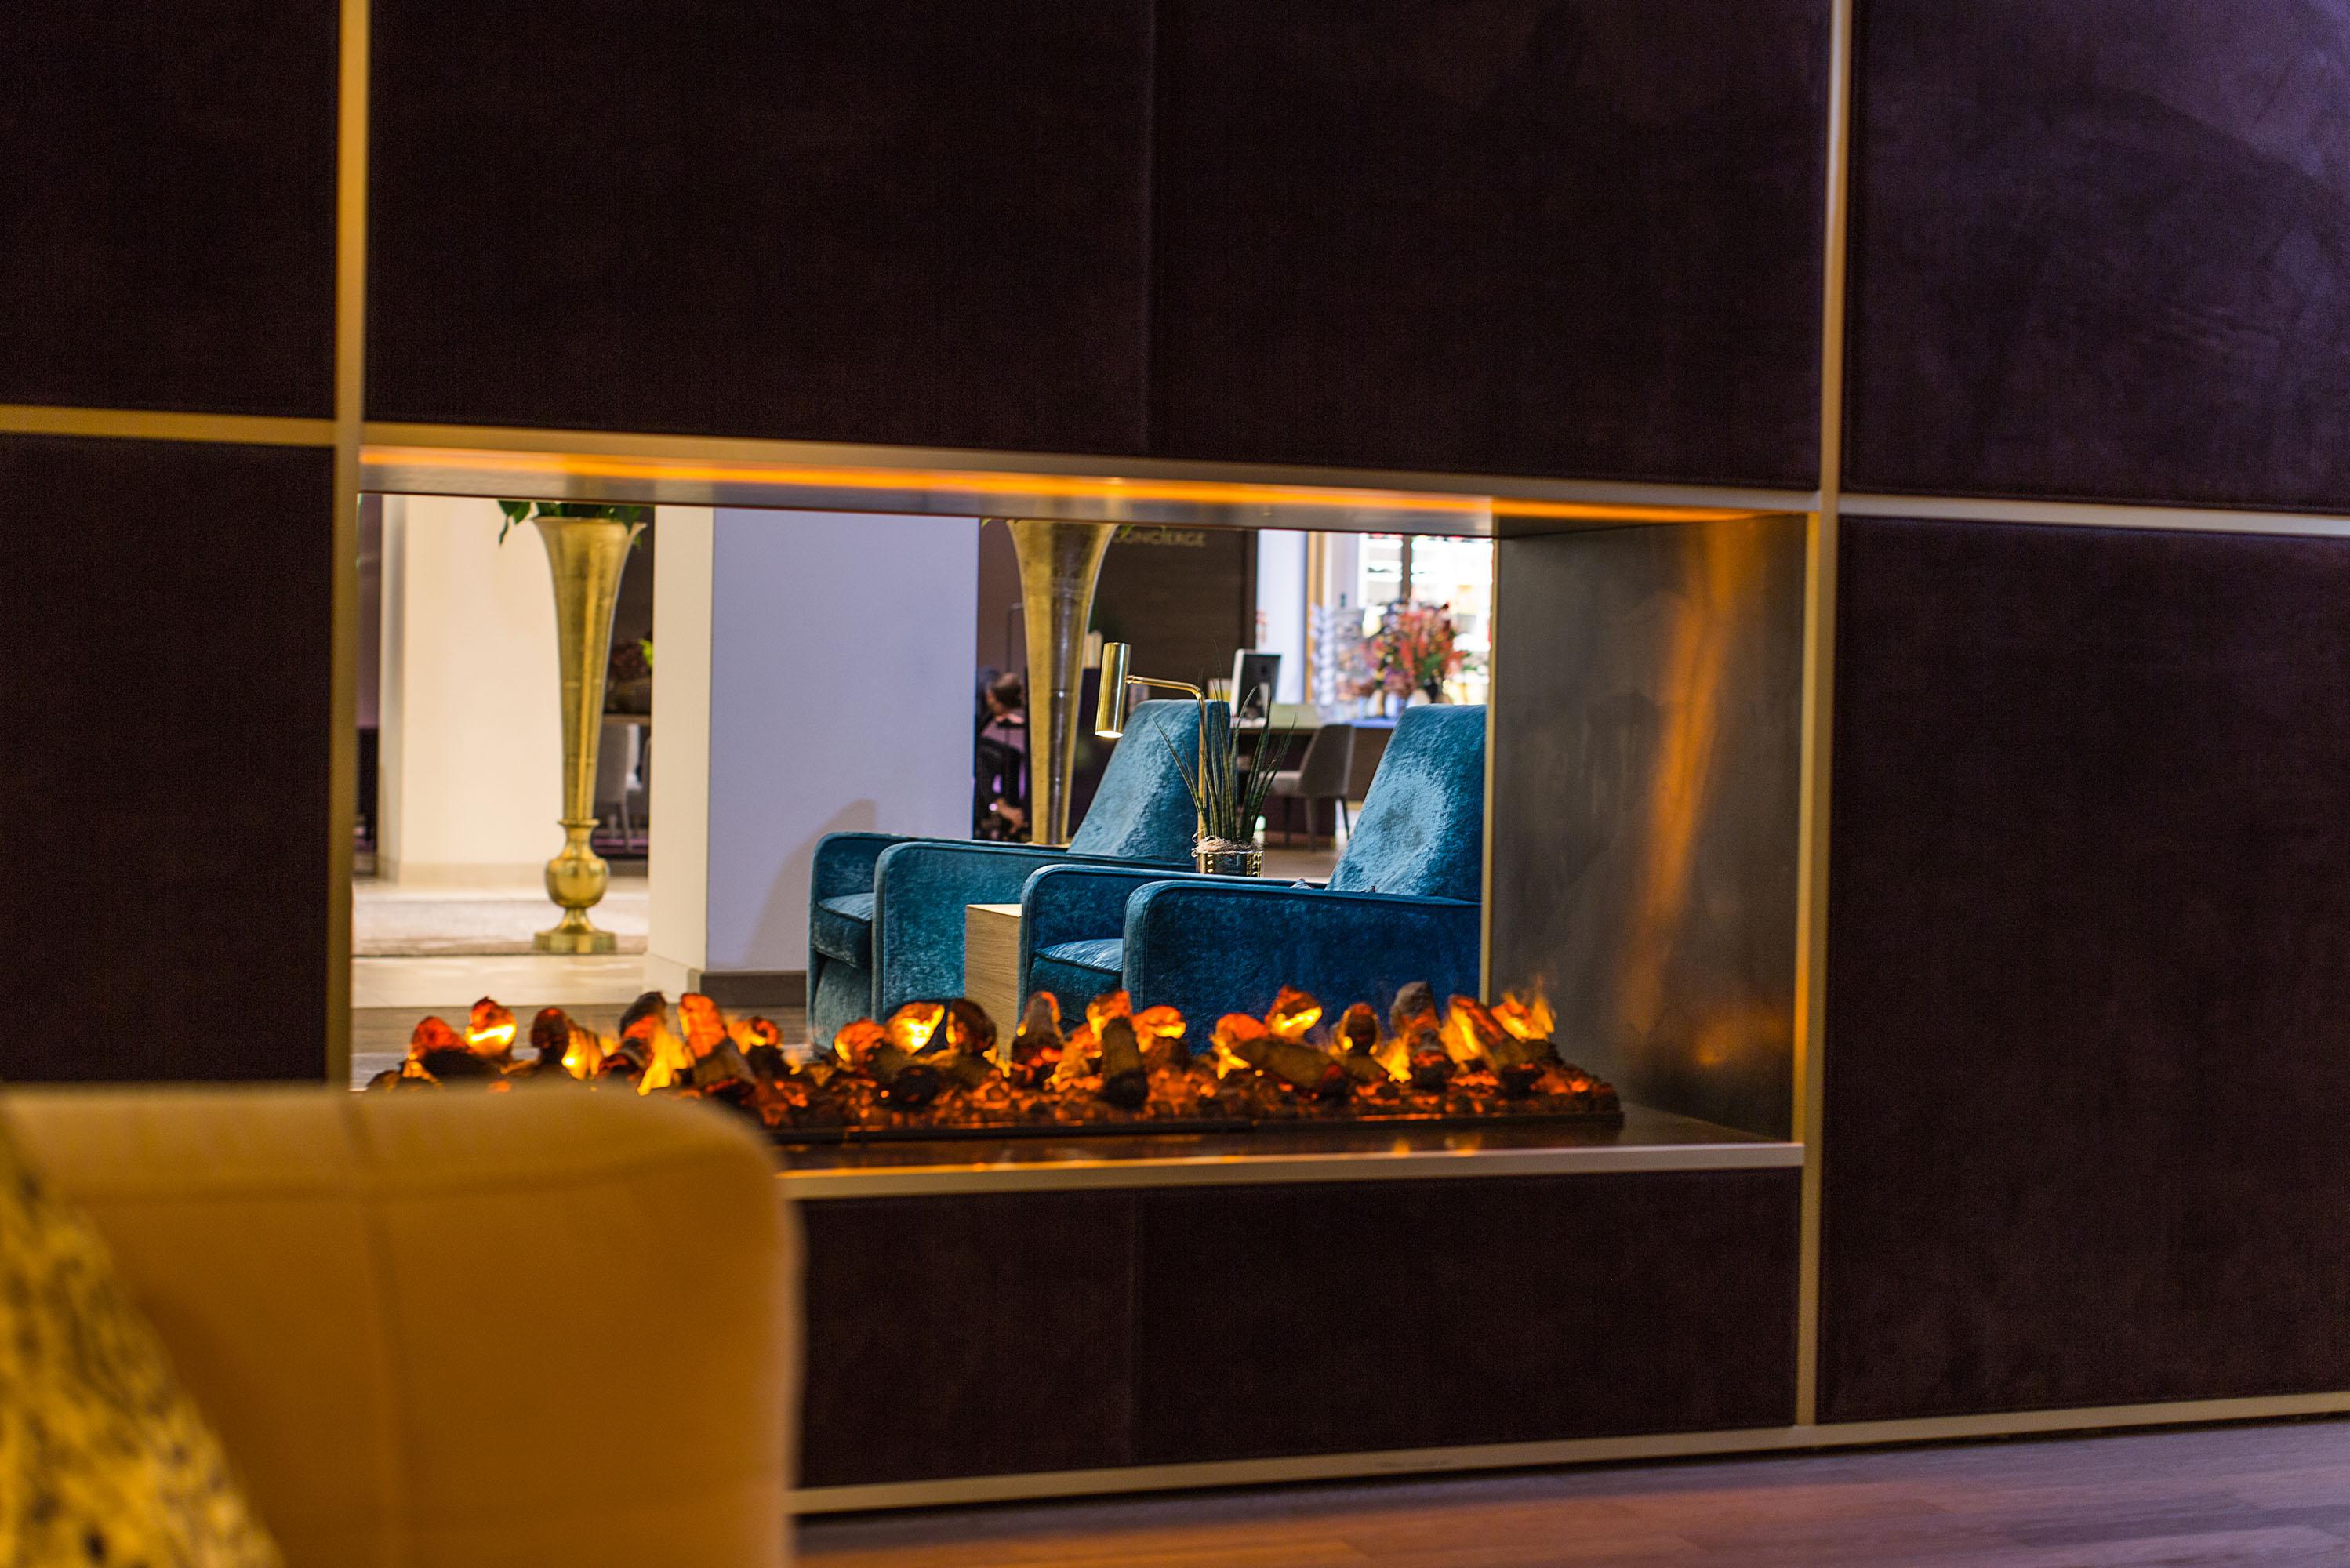 vienna house andels berlin lobby fireplace low hierwillicharbeiten. Black Bedroom Furniture Sets. Home Design Ideas